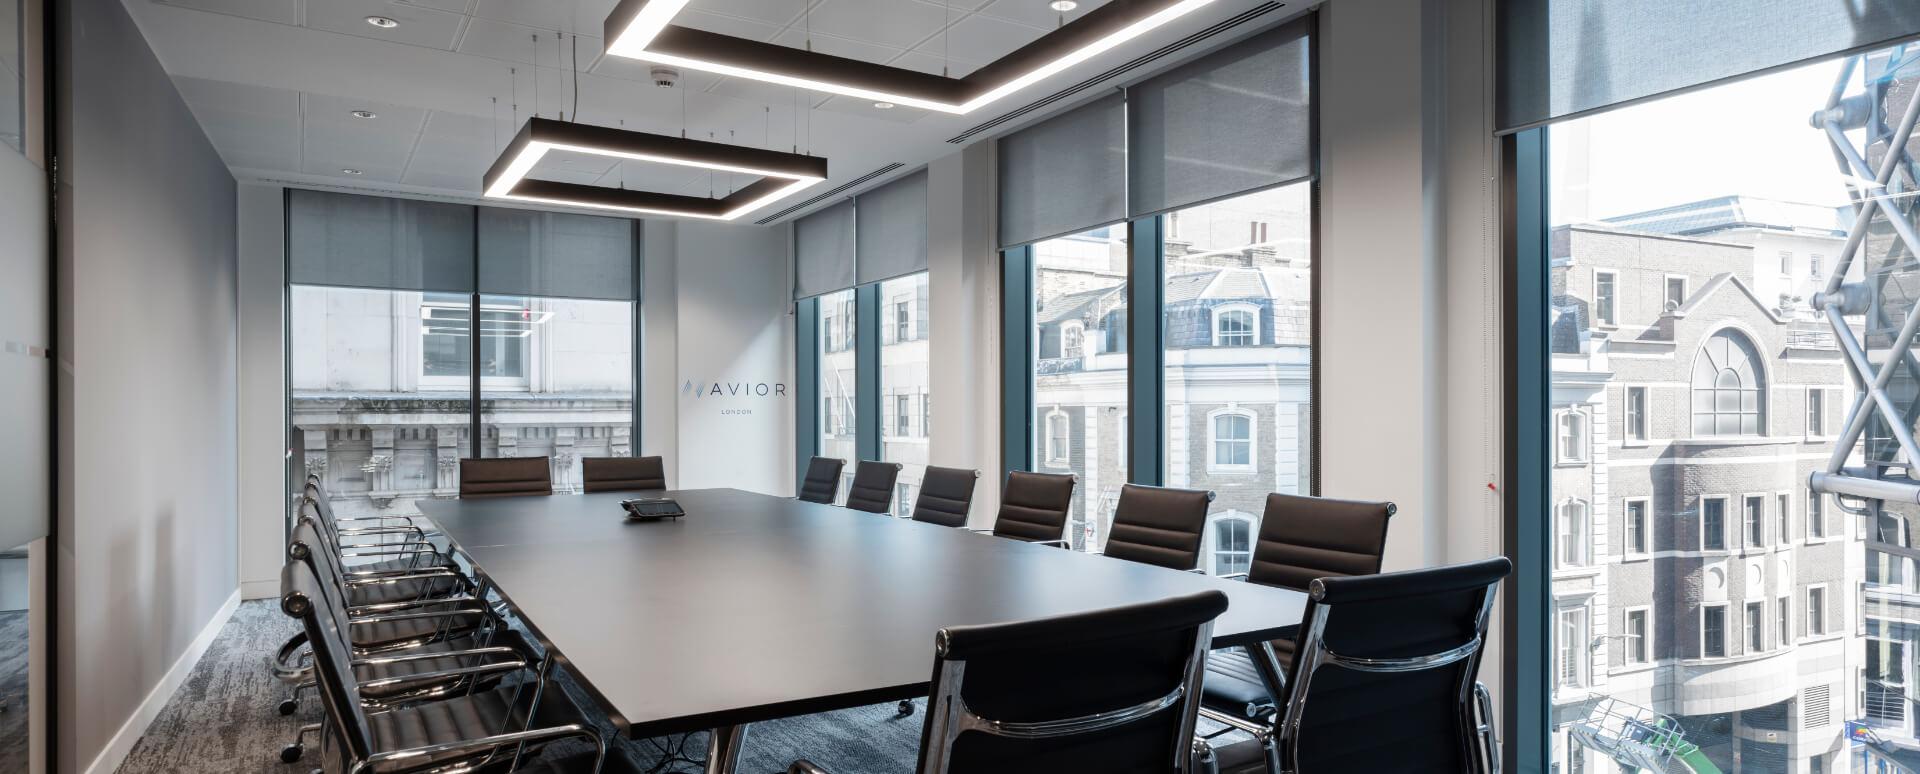 Avior Conference Room